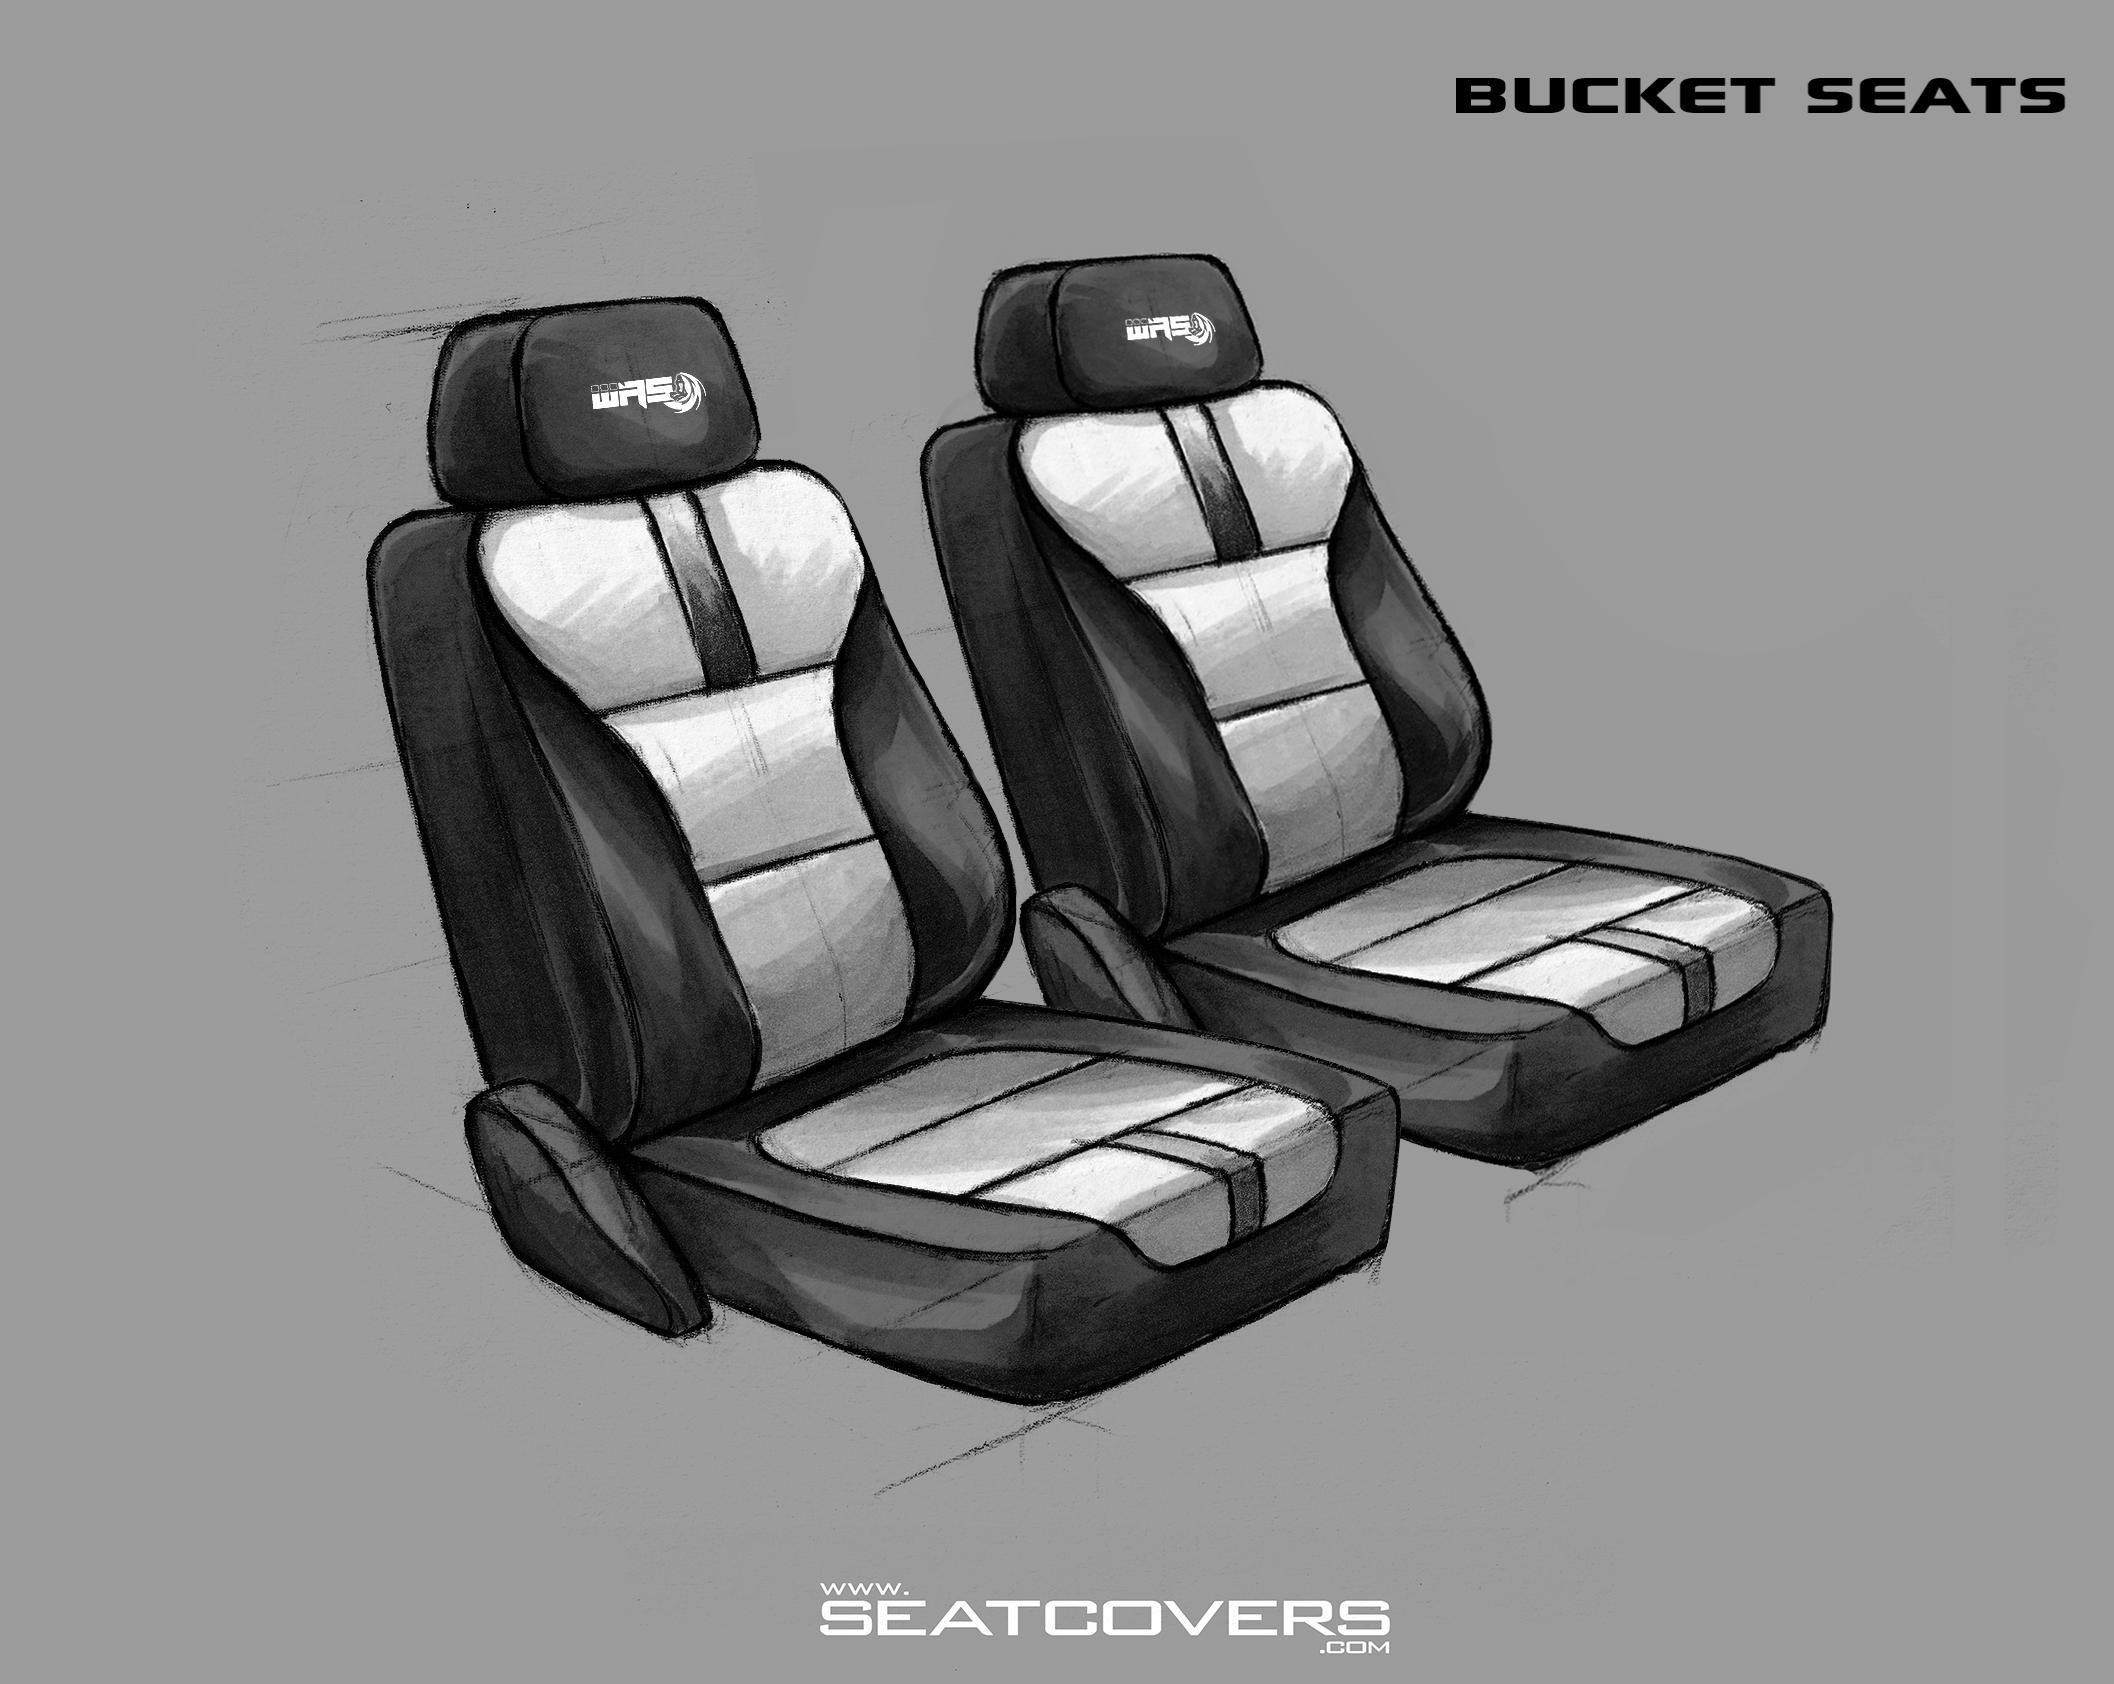 SIERRA Seat Covers SILVERADO HD Seat Covers YUKON TAHOE SUBURBAN Seat Covers www.seatcovers.com